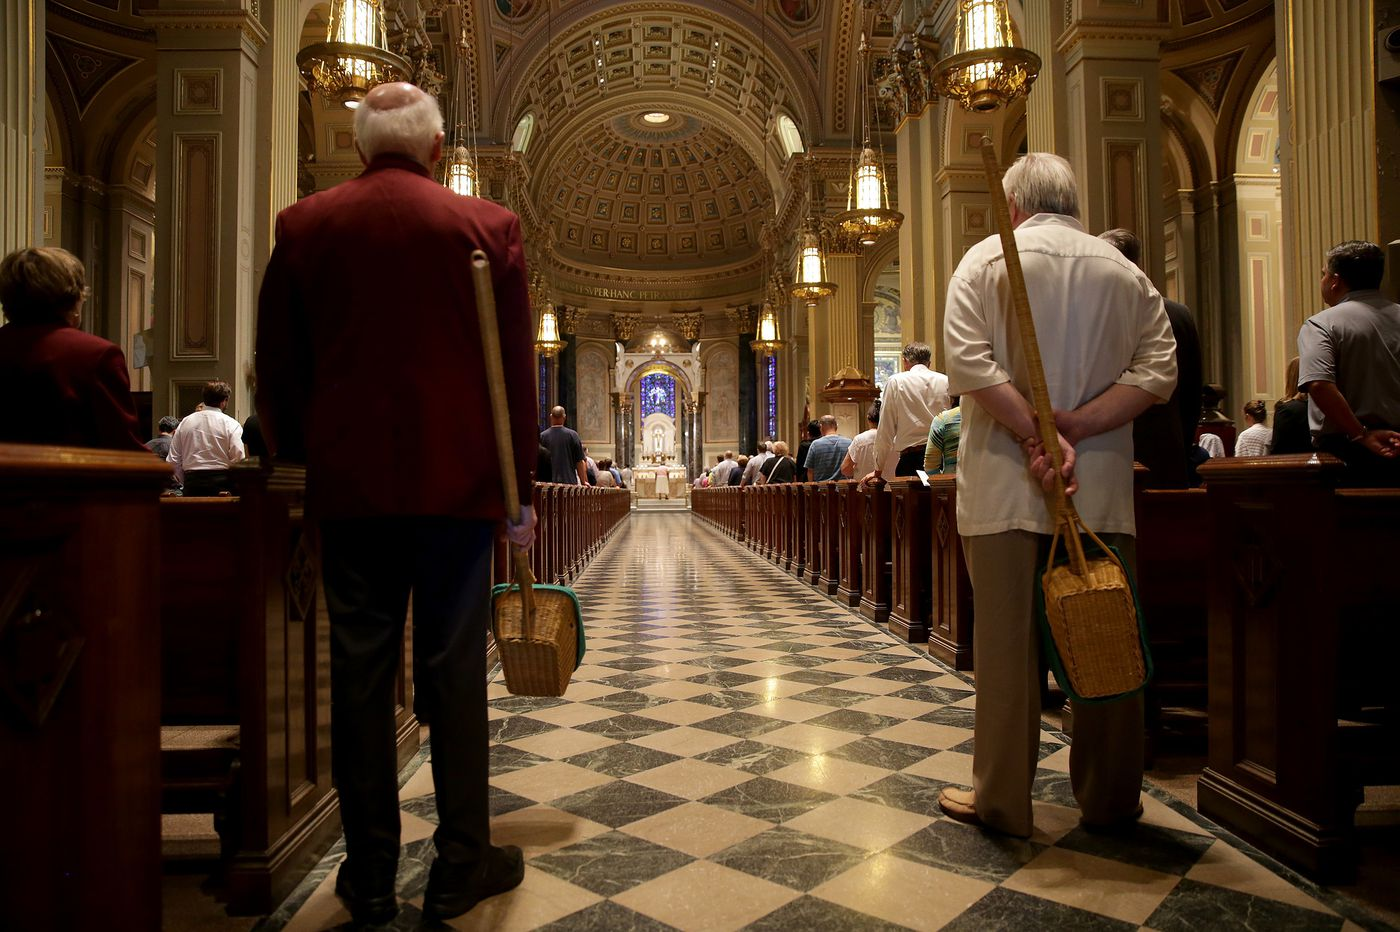 Why, despite the Catholic Church's problems, I still go to Mass | Opinion